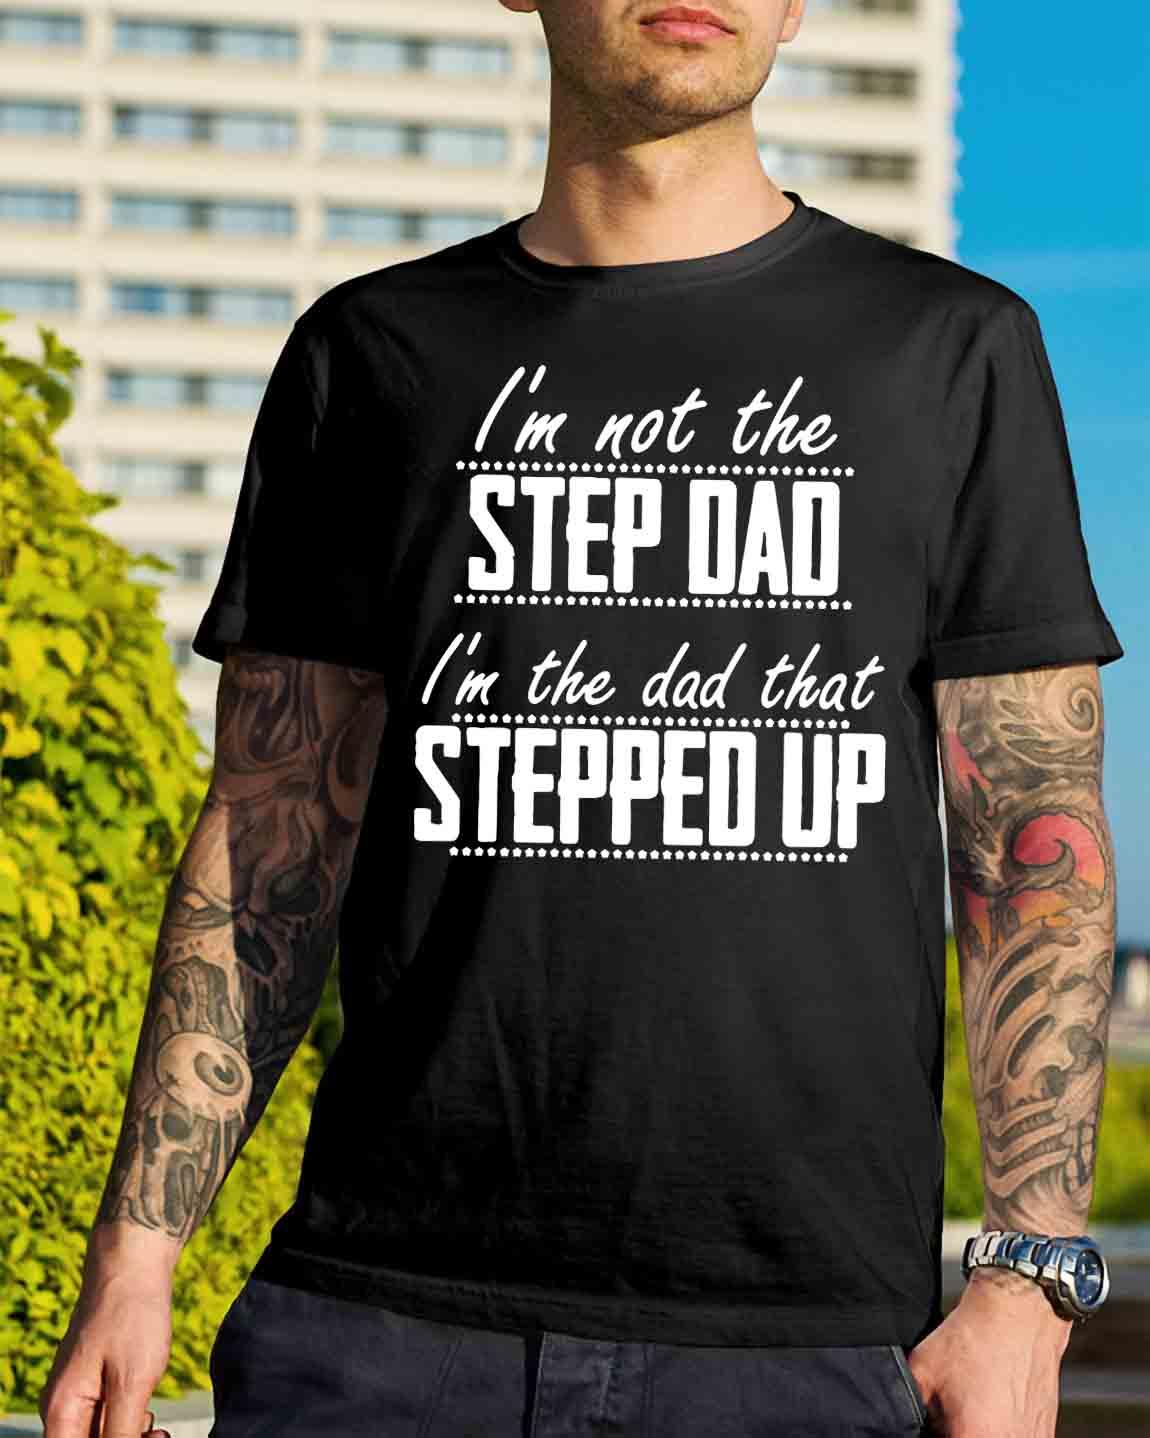 645bed47c I'm not the step dad I'm the dad that stepped up shirt, hoodie, sweater